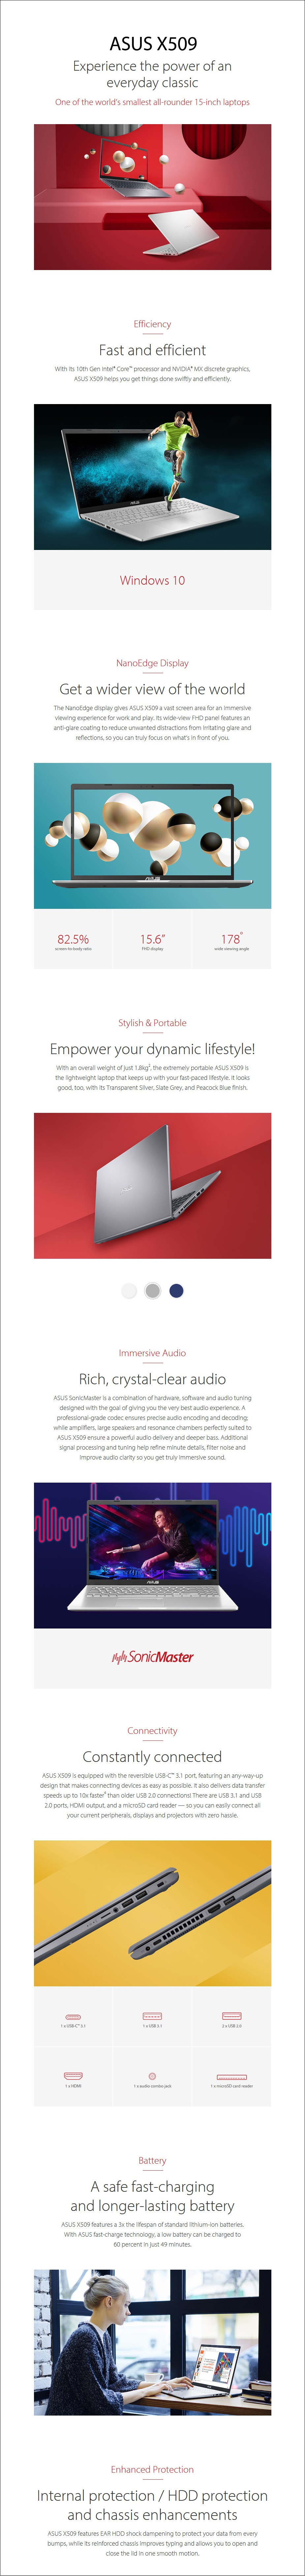 asus-x509jbej168t-156-laptop-i71065g7-8gb-512gb-mx110-w10h-ac33638-6.jpg